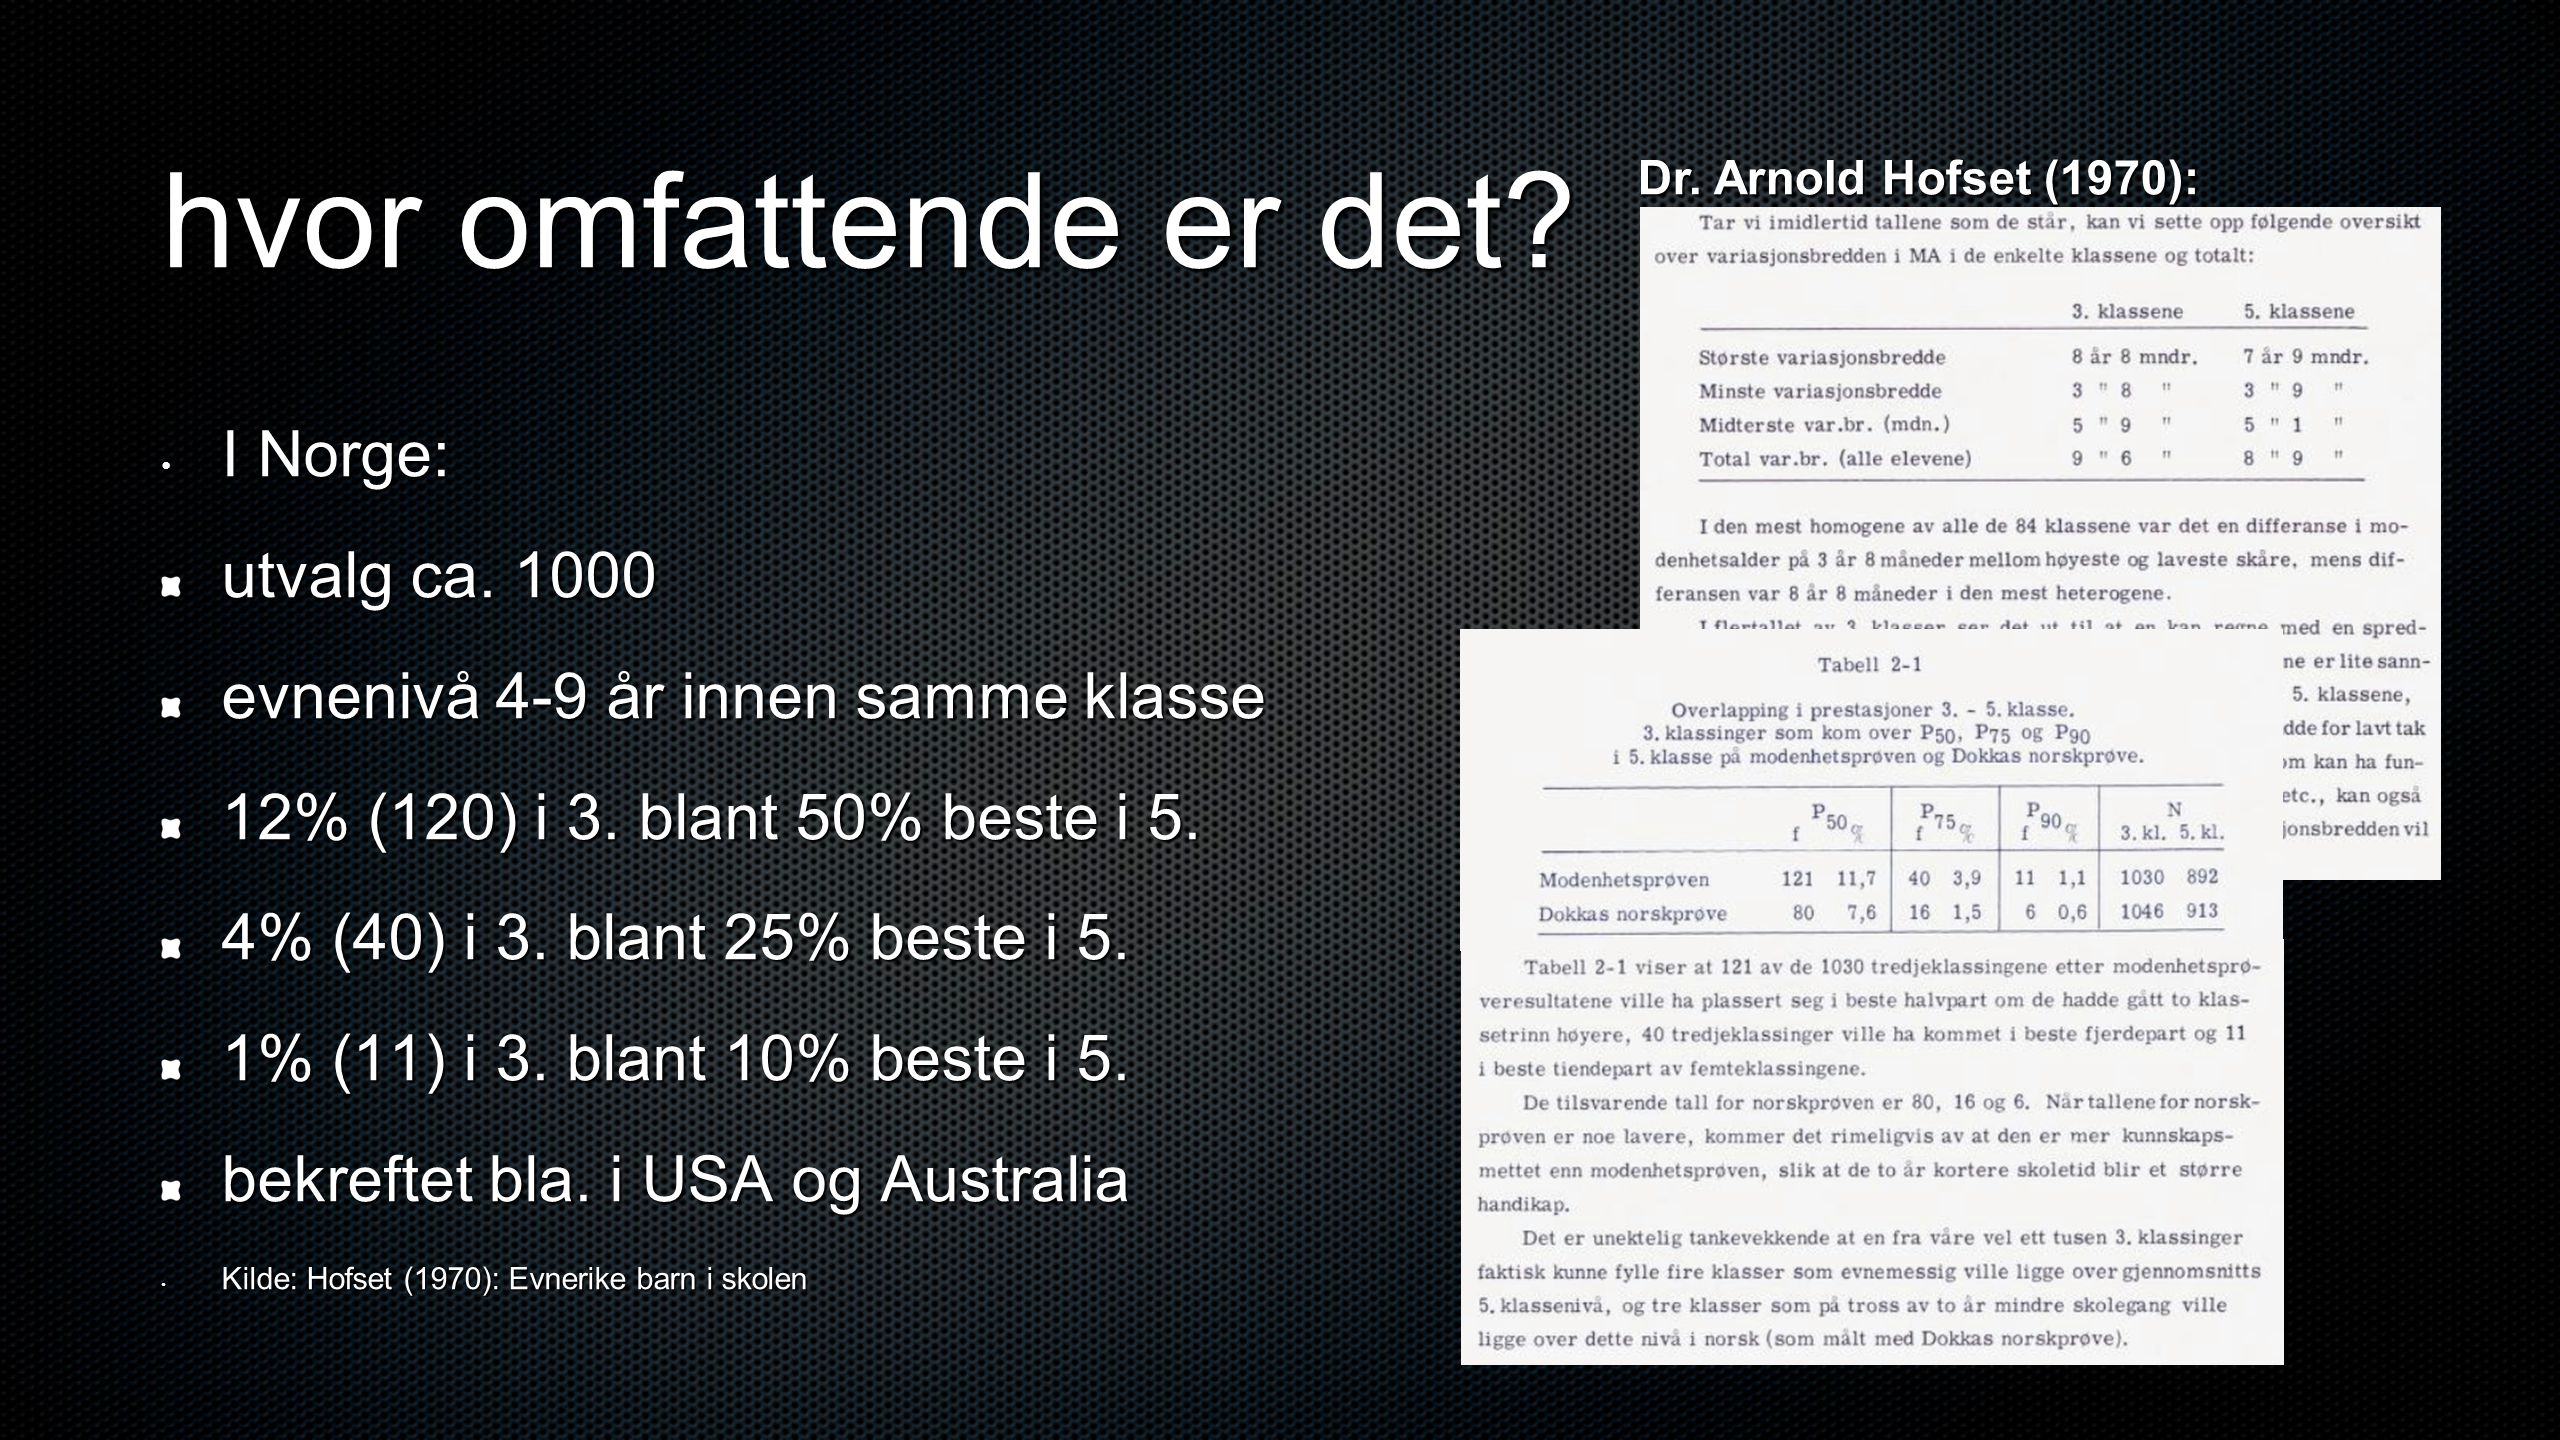 hvor omfattende er det I Norge: utvalg ca. 1000